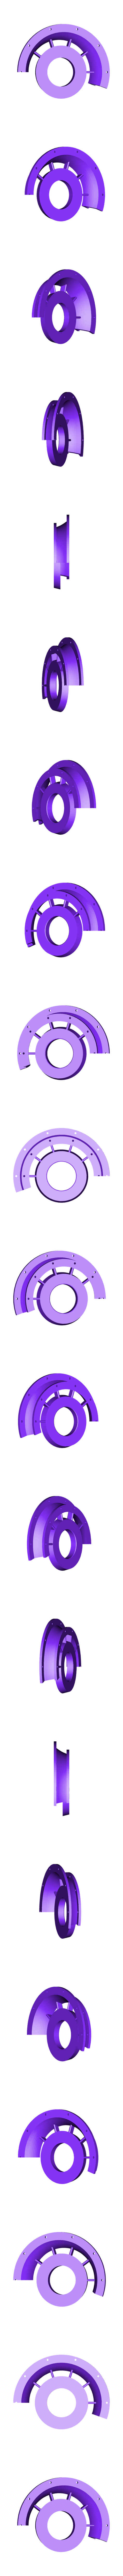 HPT-Case01.stl Download free STL file Jet Engine, 3-Spool • 3D printable object, konchan77